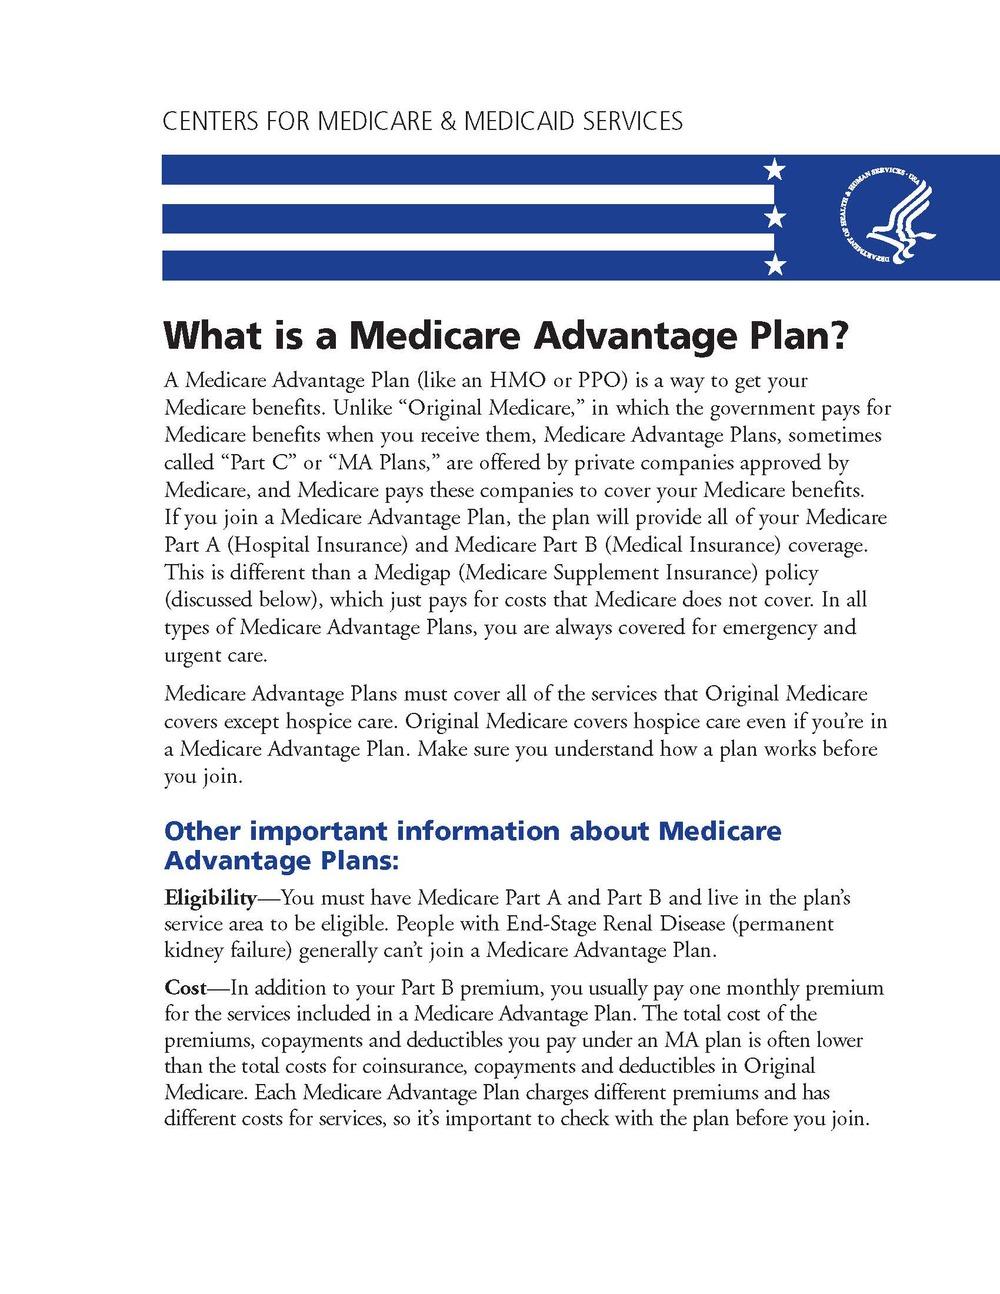 What is a Medicare Advantage Plan?